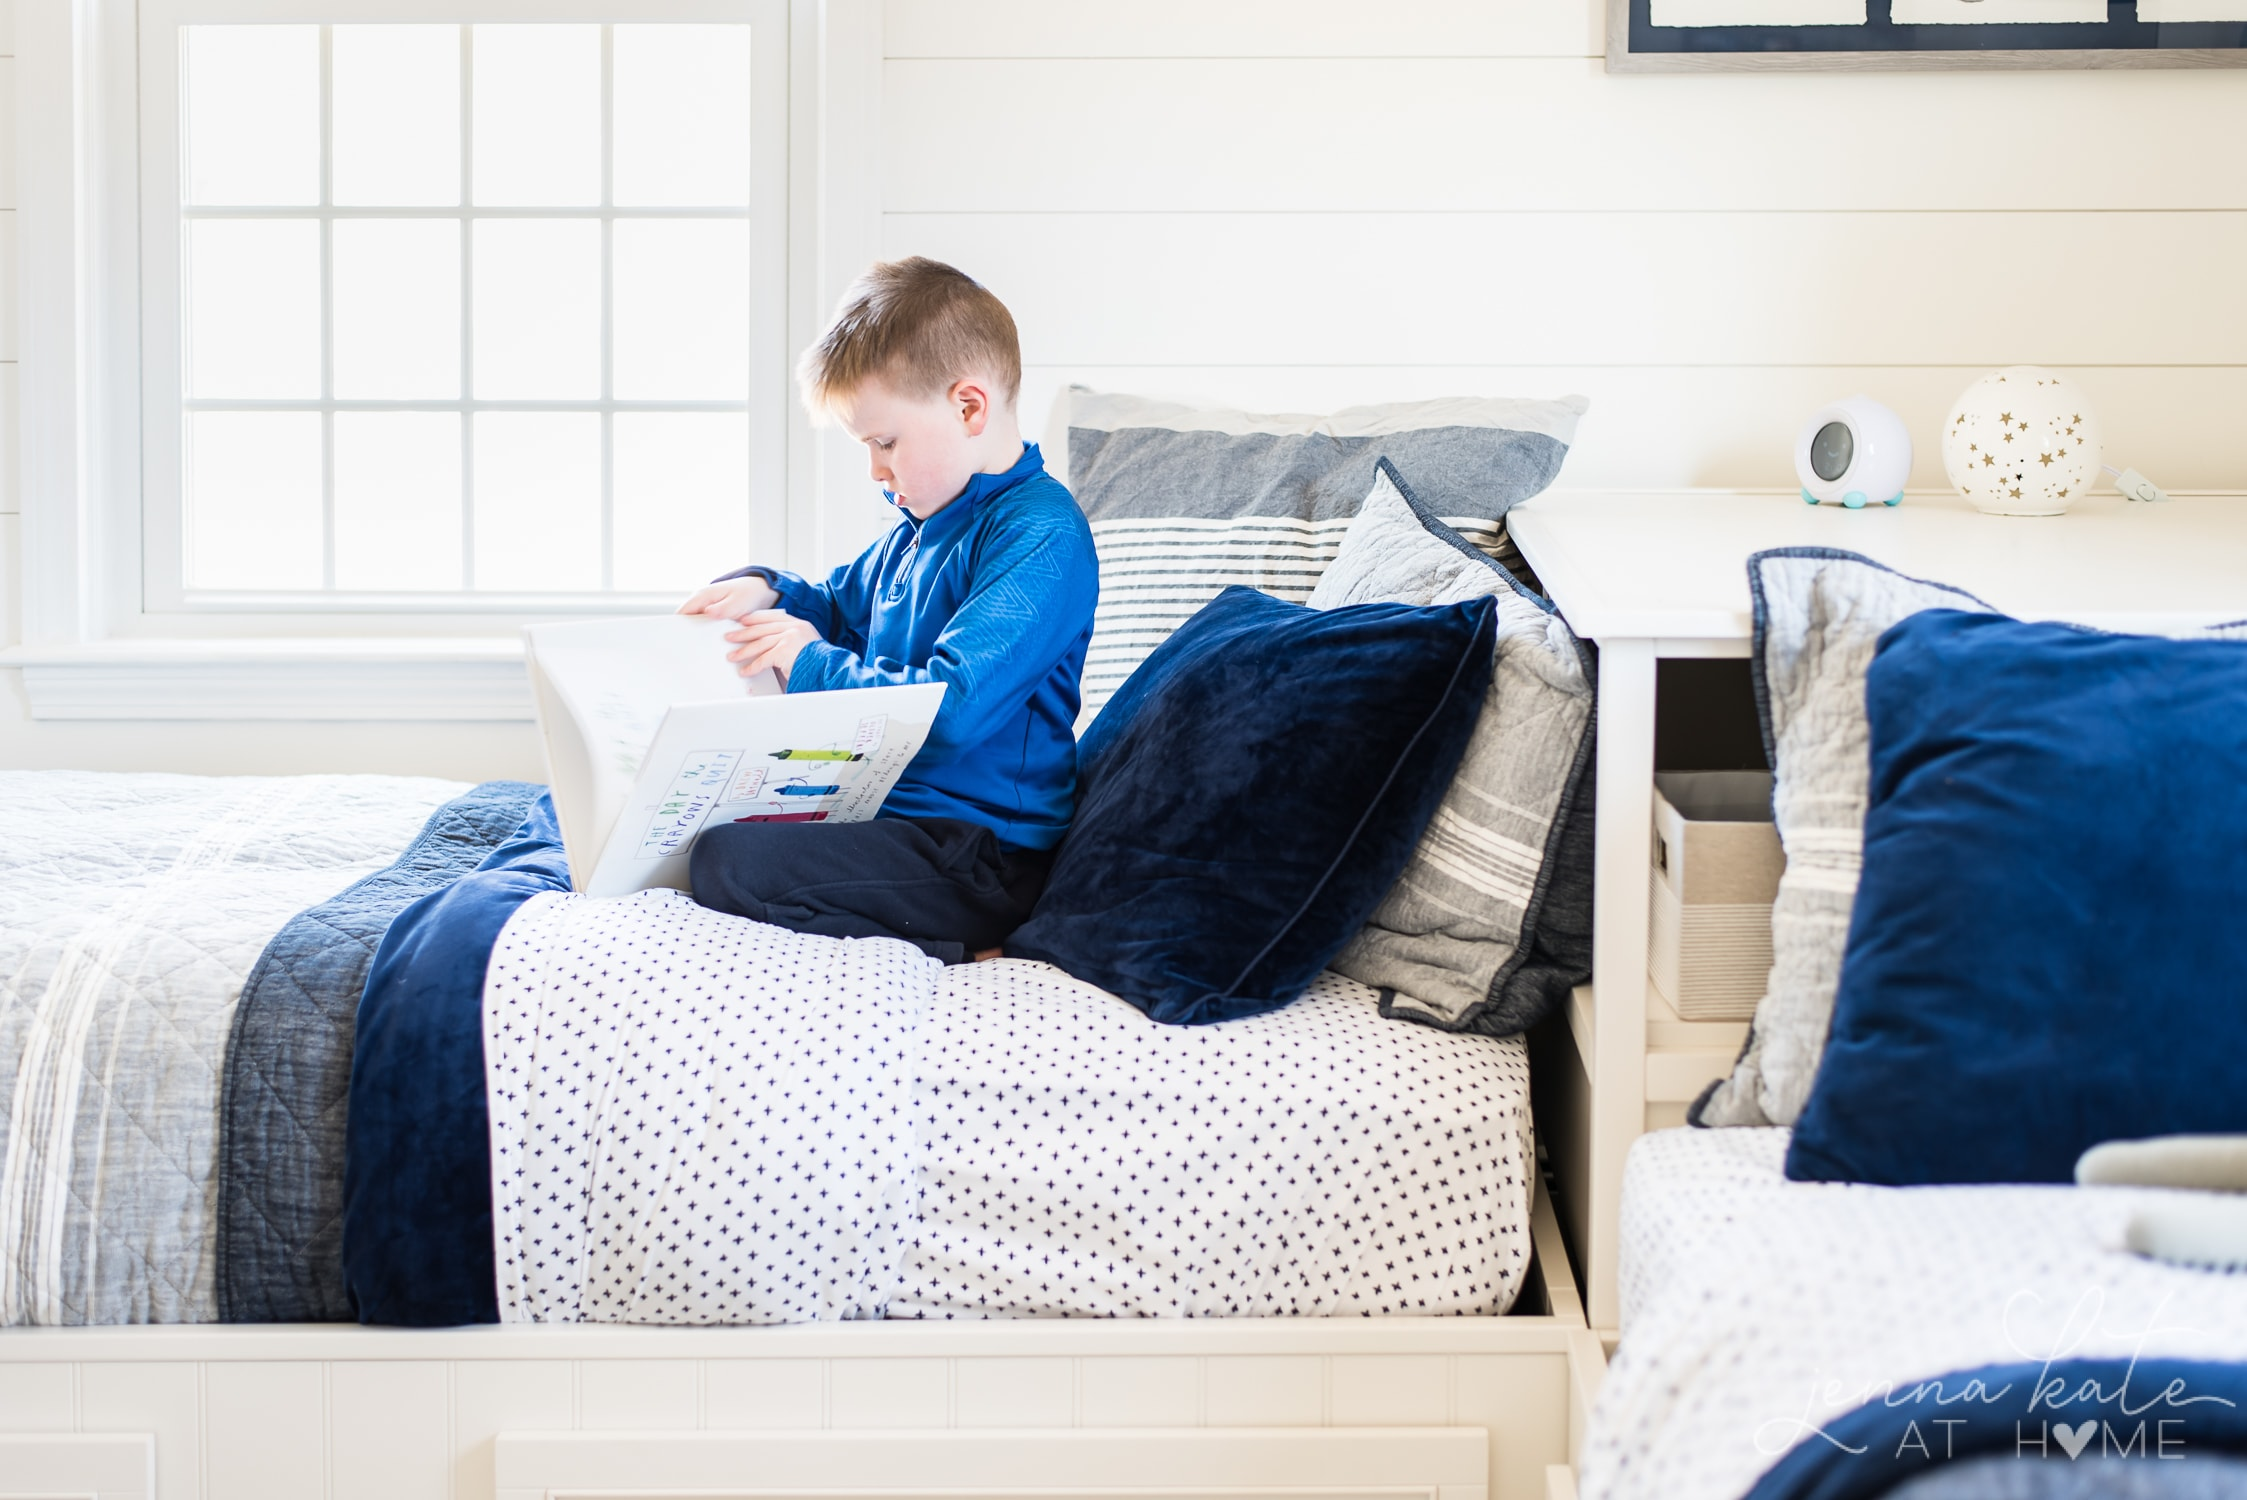 boy bedding, decor and design ideas for big kid bedroom